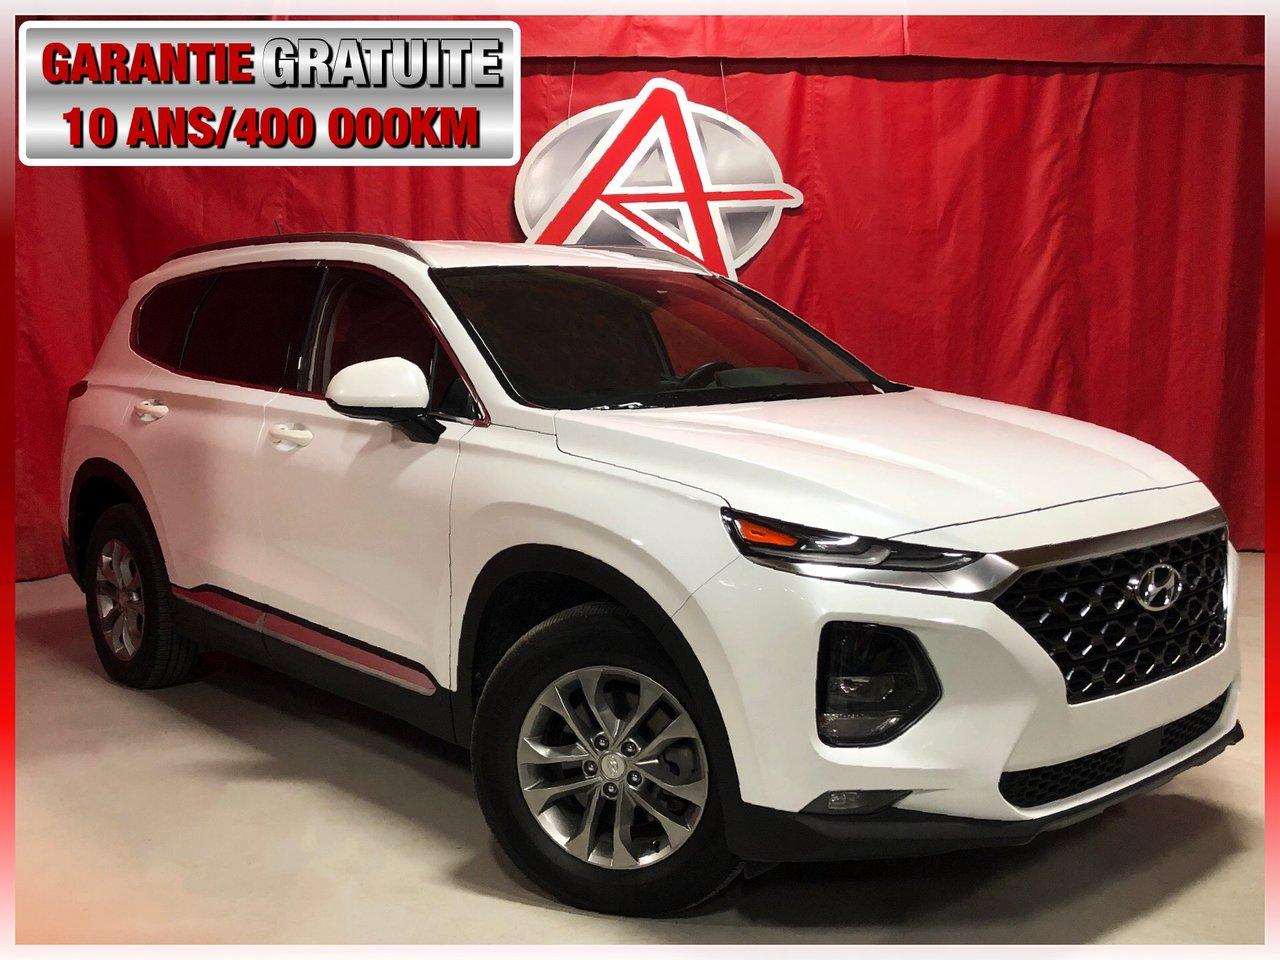 Hyundai Santa Fe 2020 * AWD * GARANTIE GRATUITE 10 ANS / 400 000KM